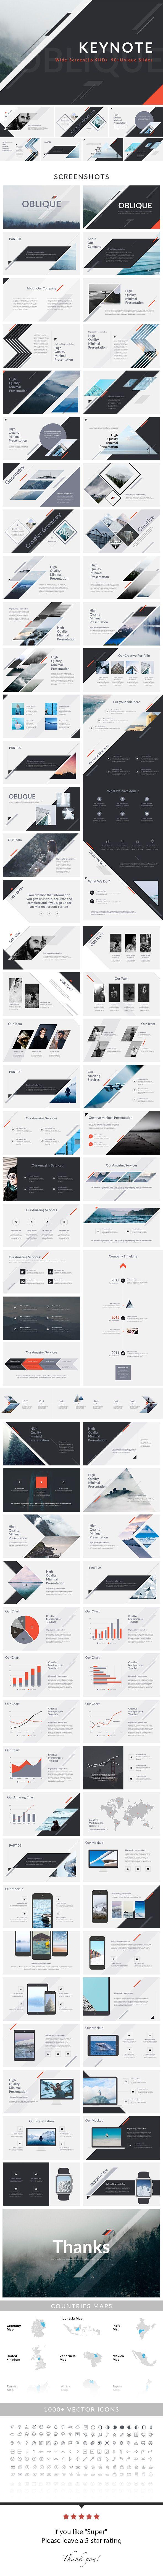 Oblique keynote presentation template presentation templates oblique keynote presentation template toneelgroepblik Choice Image